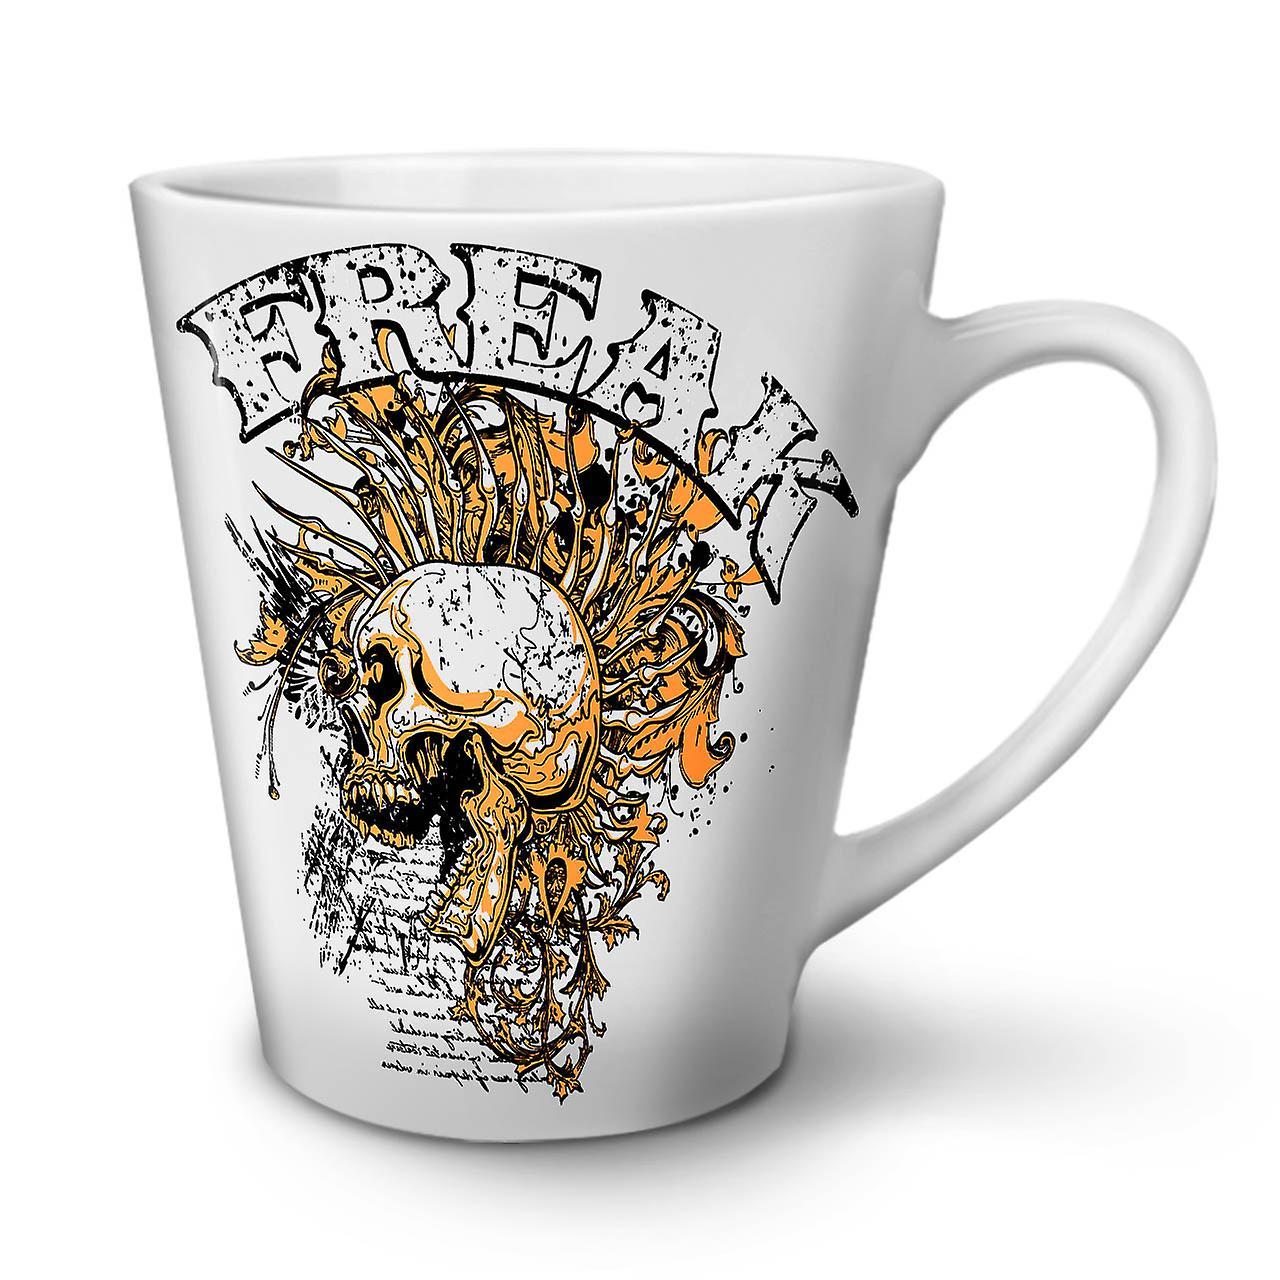 Mug Ceramic Freak Coffee OzWellcoda Skull 12 Tea New Funk Rock White Latte lK1TJuFc3